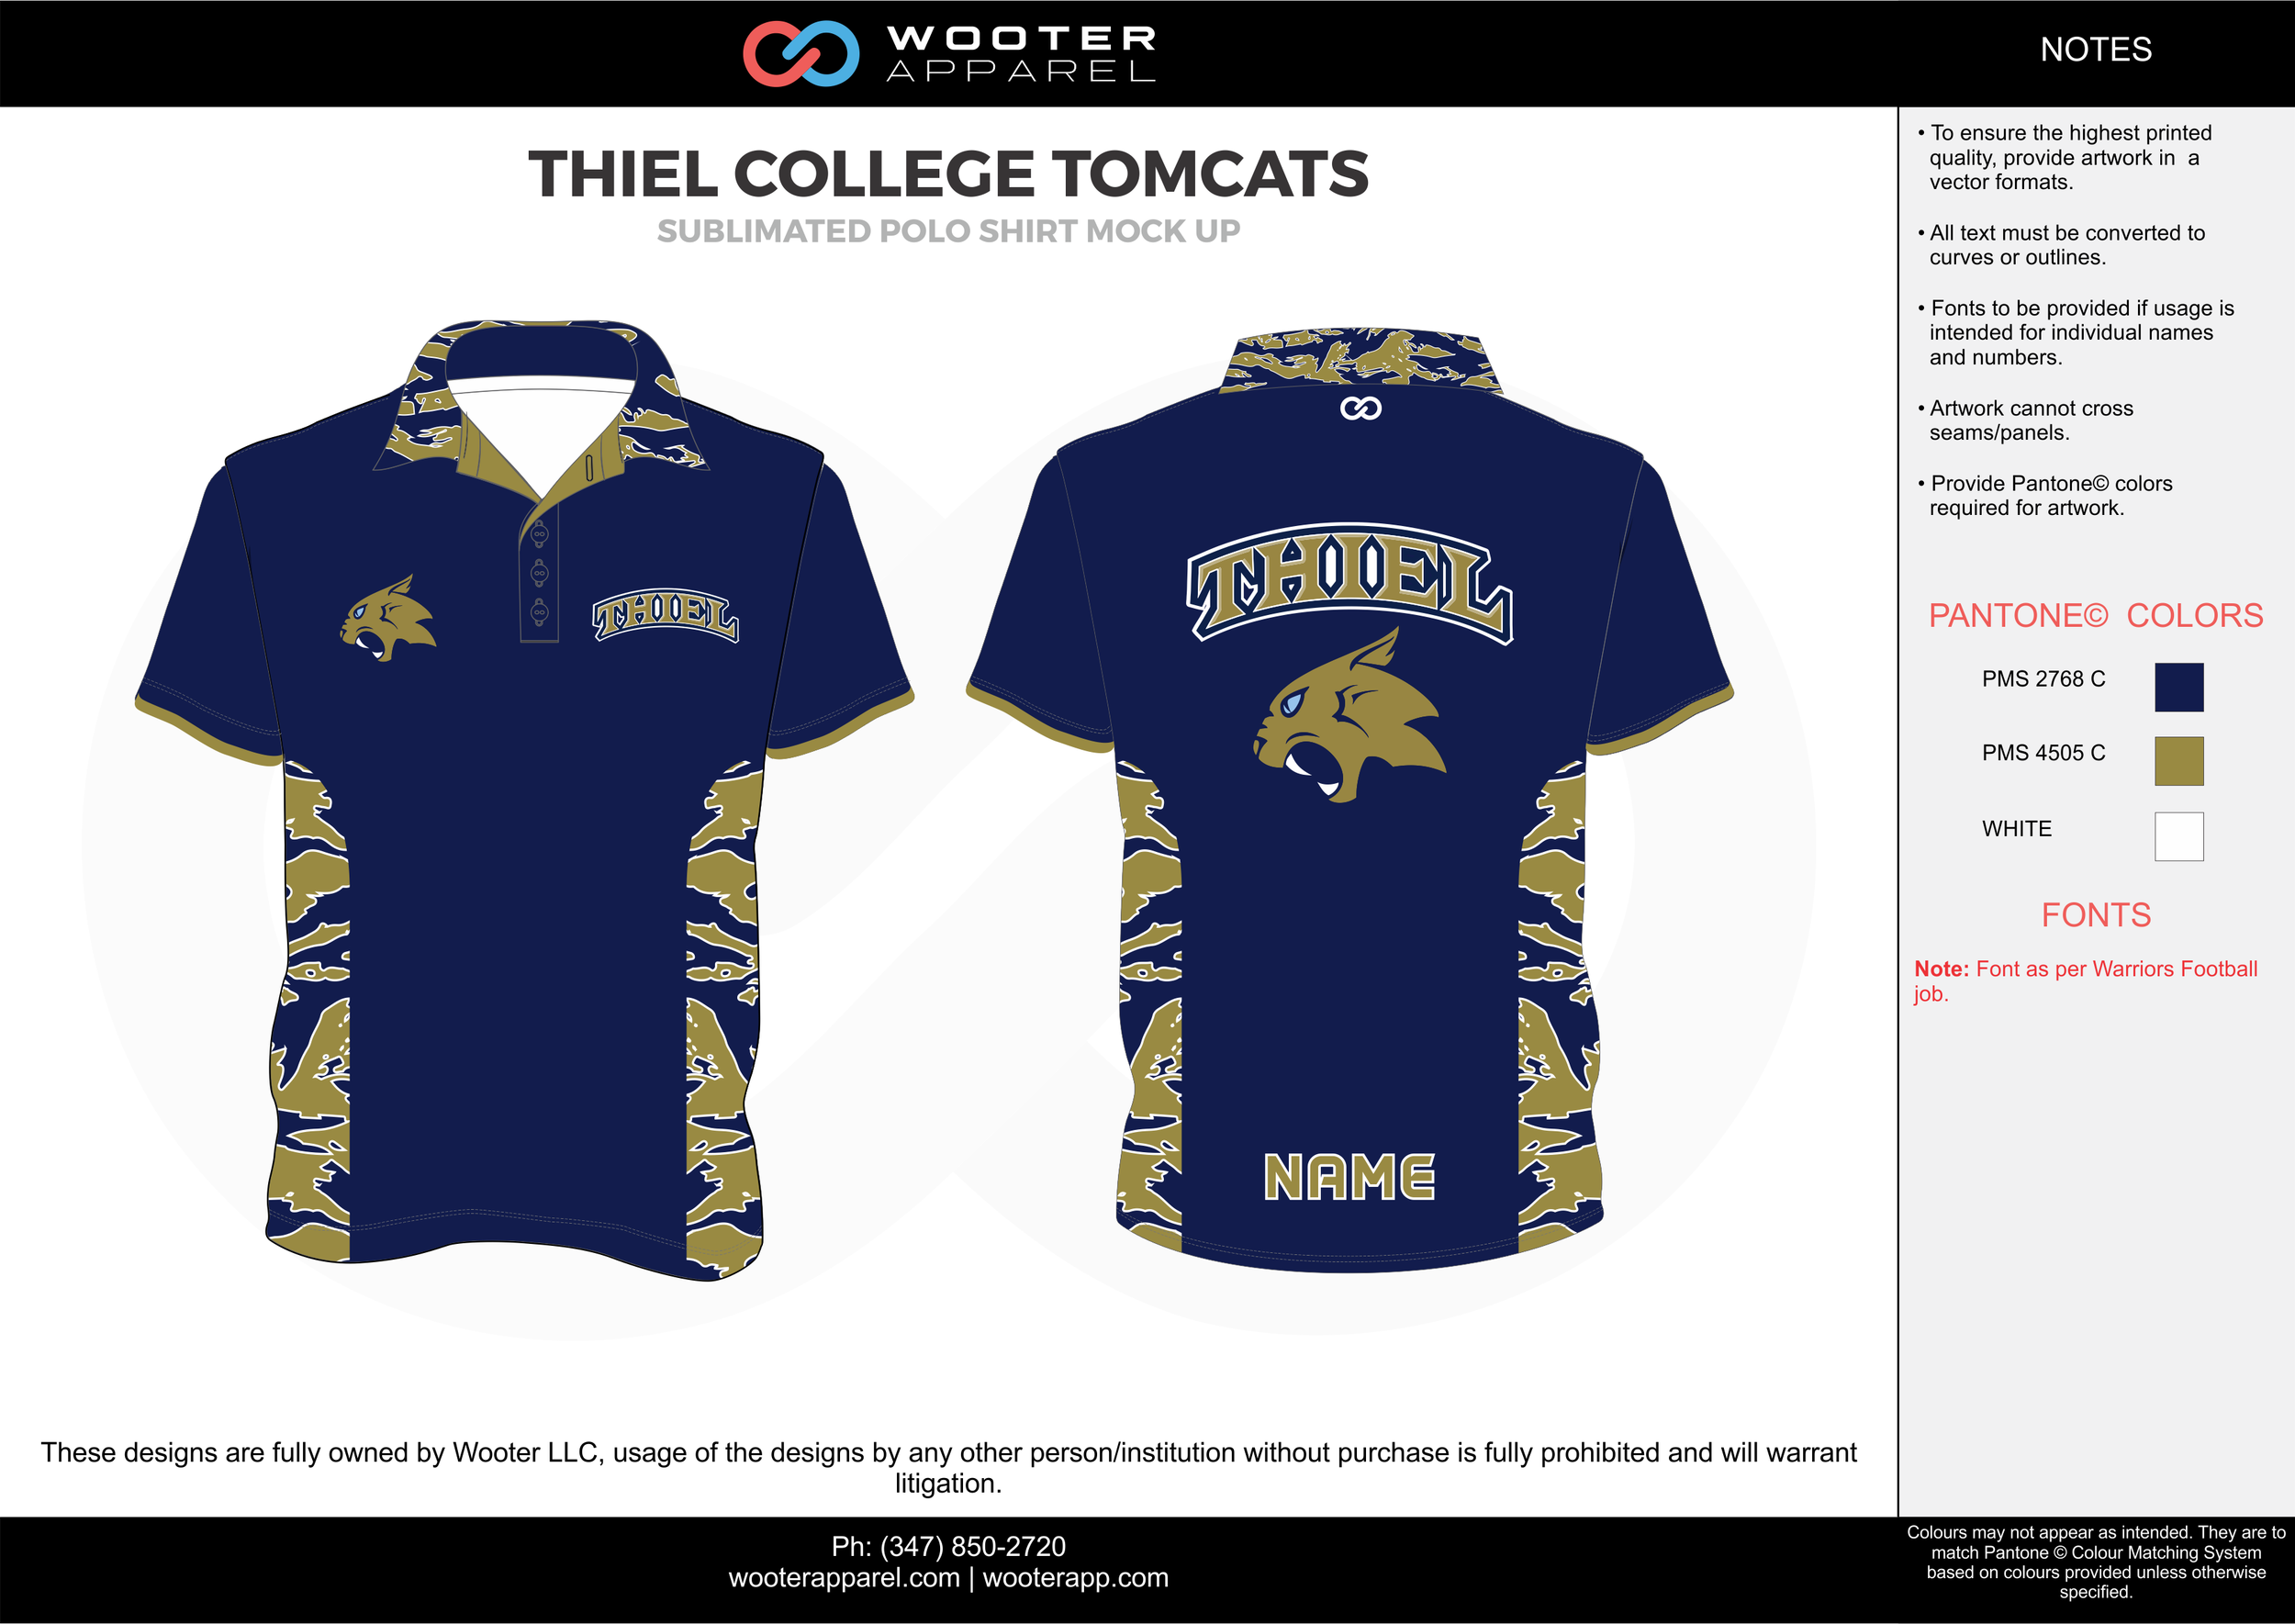 THIEL COLLEGE TOMCATS dark blue khaki white Polo Shirts